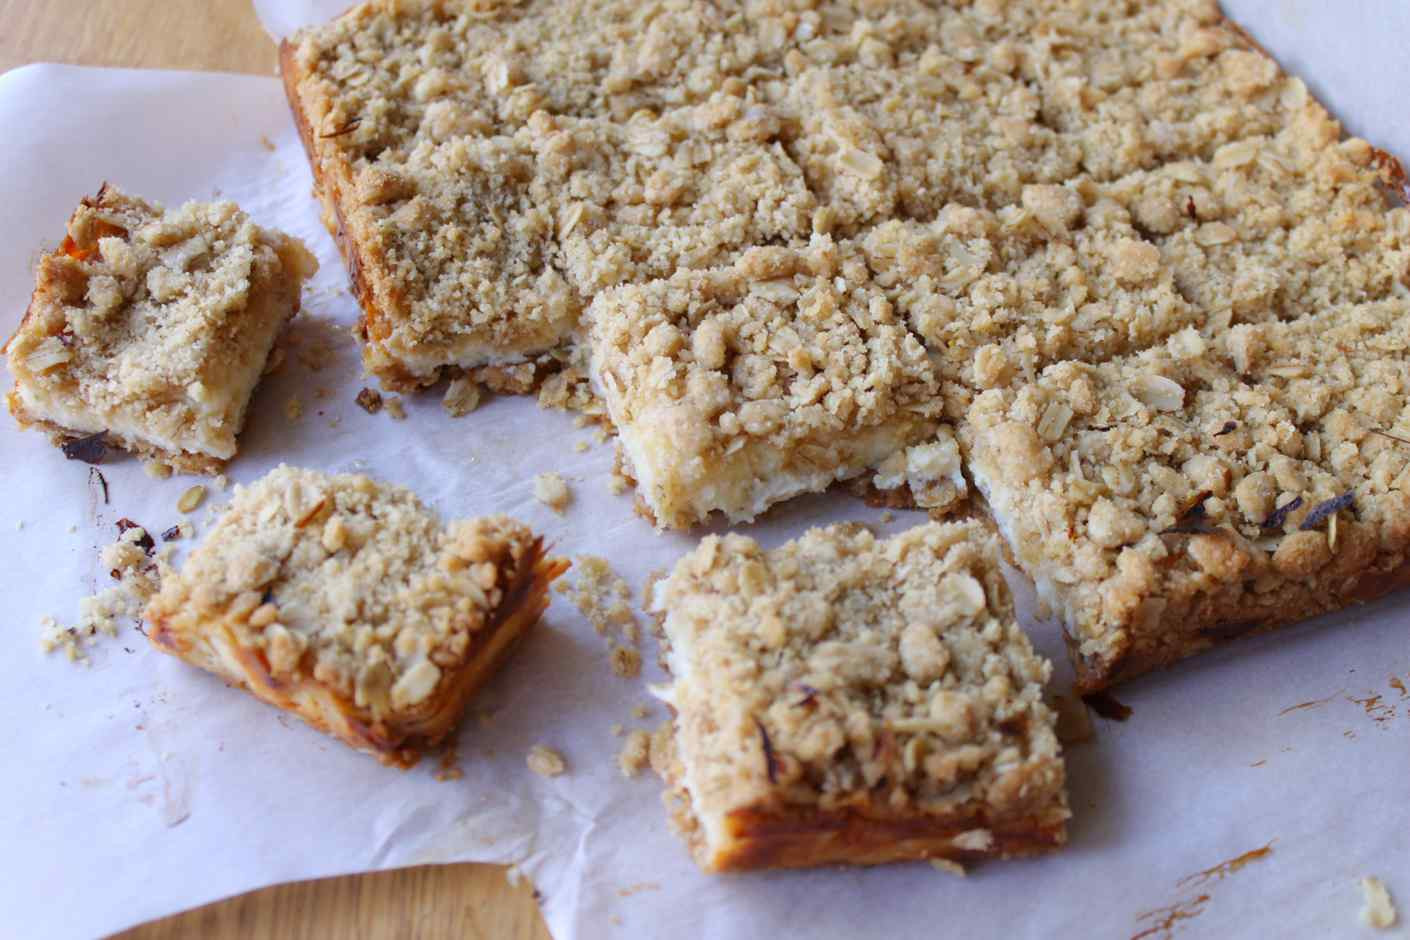 Oatmeal Dessert Recipes  creamy lime oatmeal bars recipe story of a kitchen